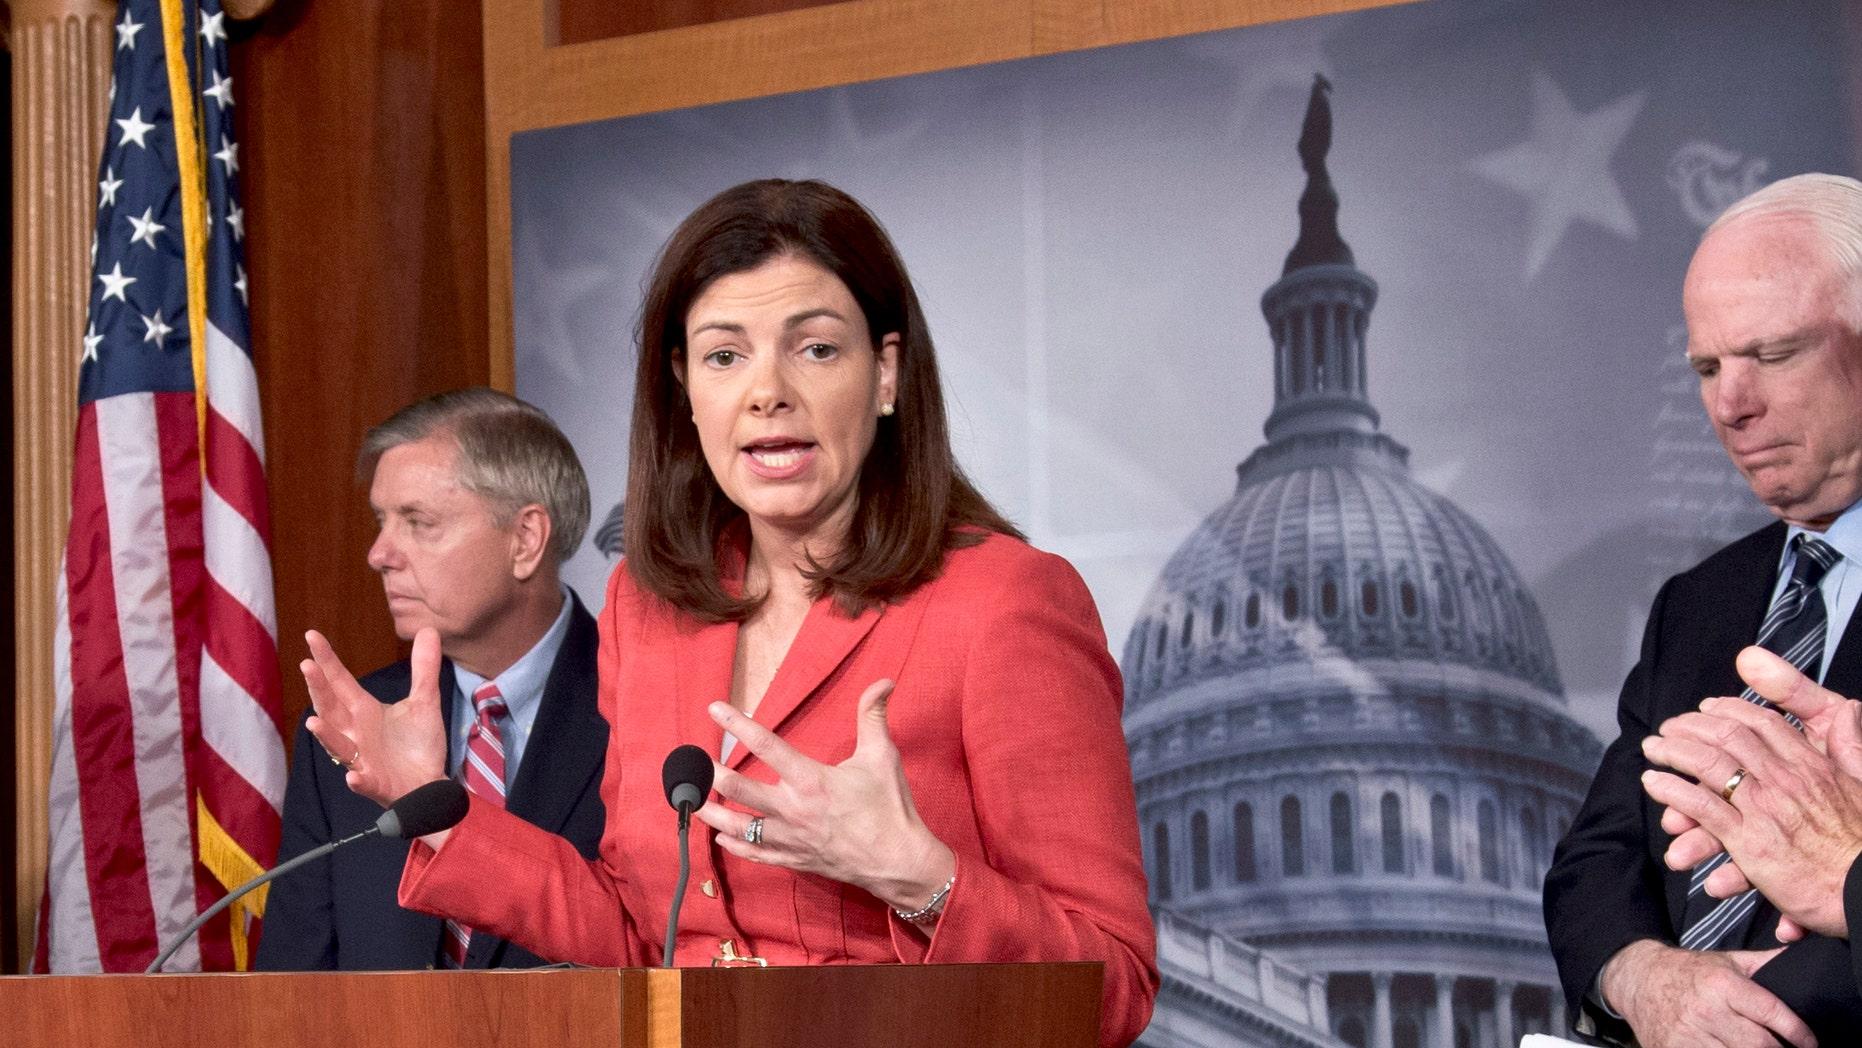 Sen. Kelly Ayotte, R-N.H., asked Secretary of Agriculture Tom Vilsack to intervene on behalf of the district. (AP)